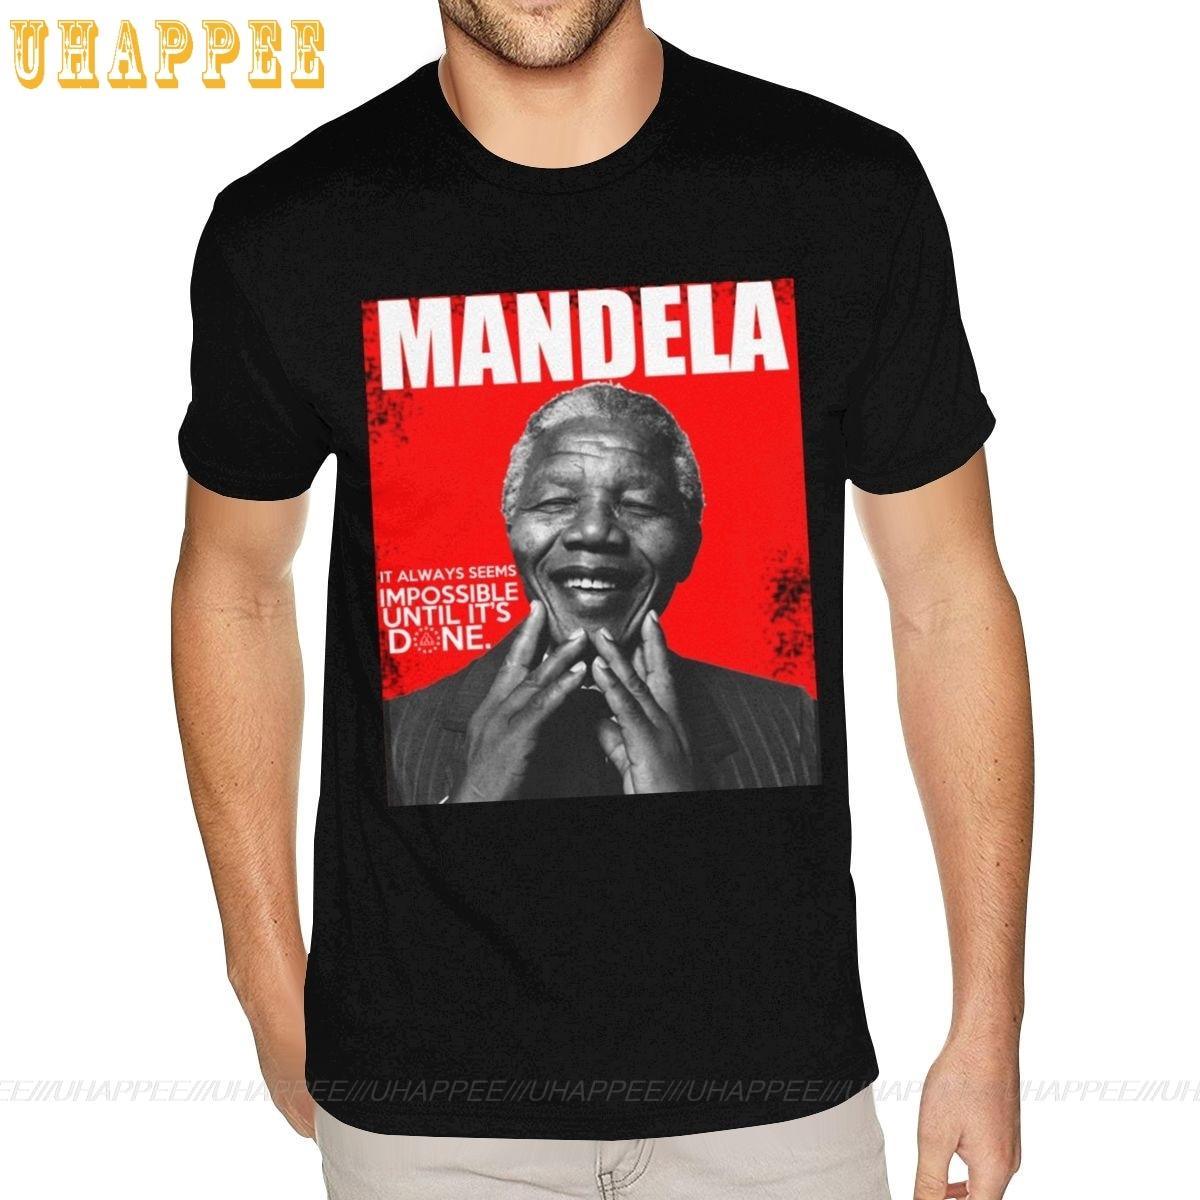 Oversized Nelson Mandela Impossible Until Its Done camisetas para hombre XXXL manga corta de algodón cuello redondo Camiseta